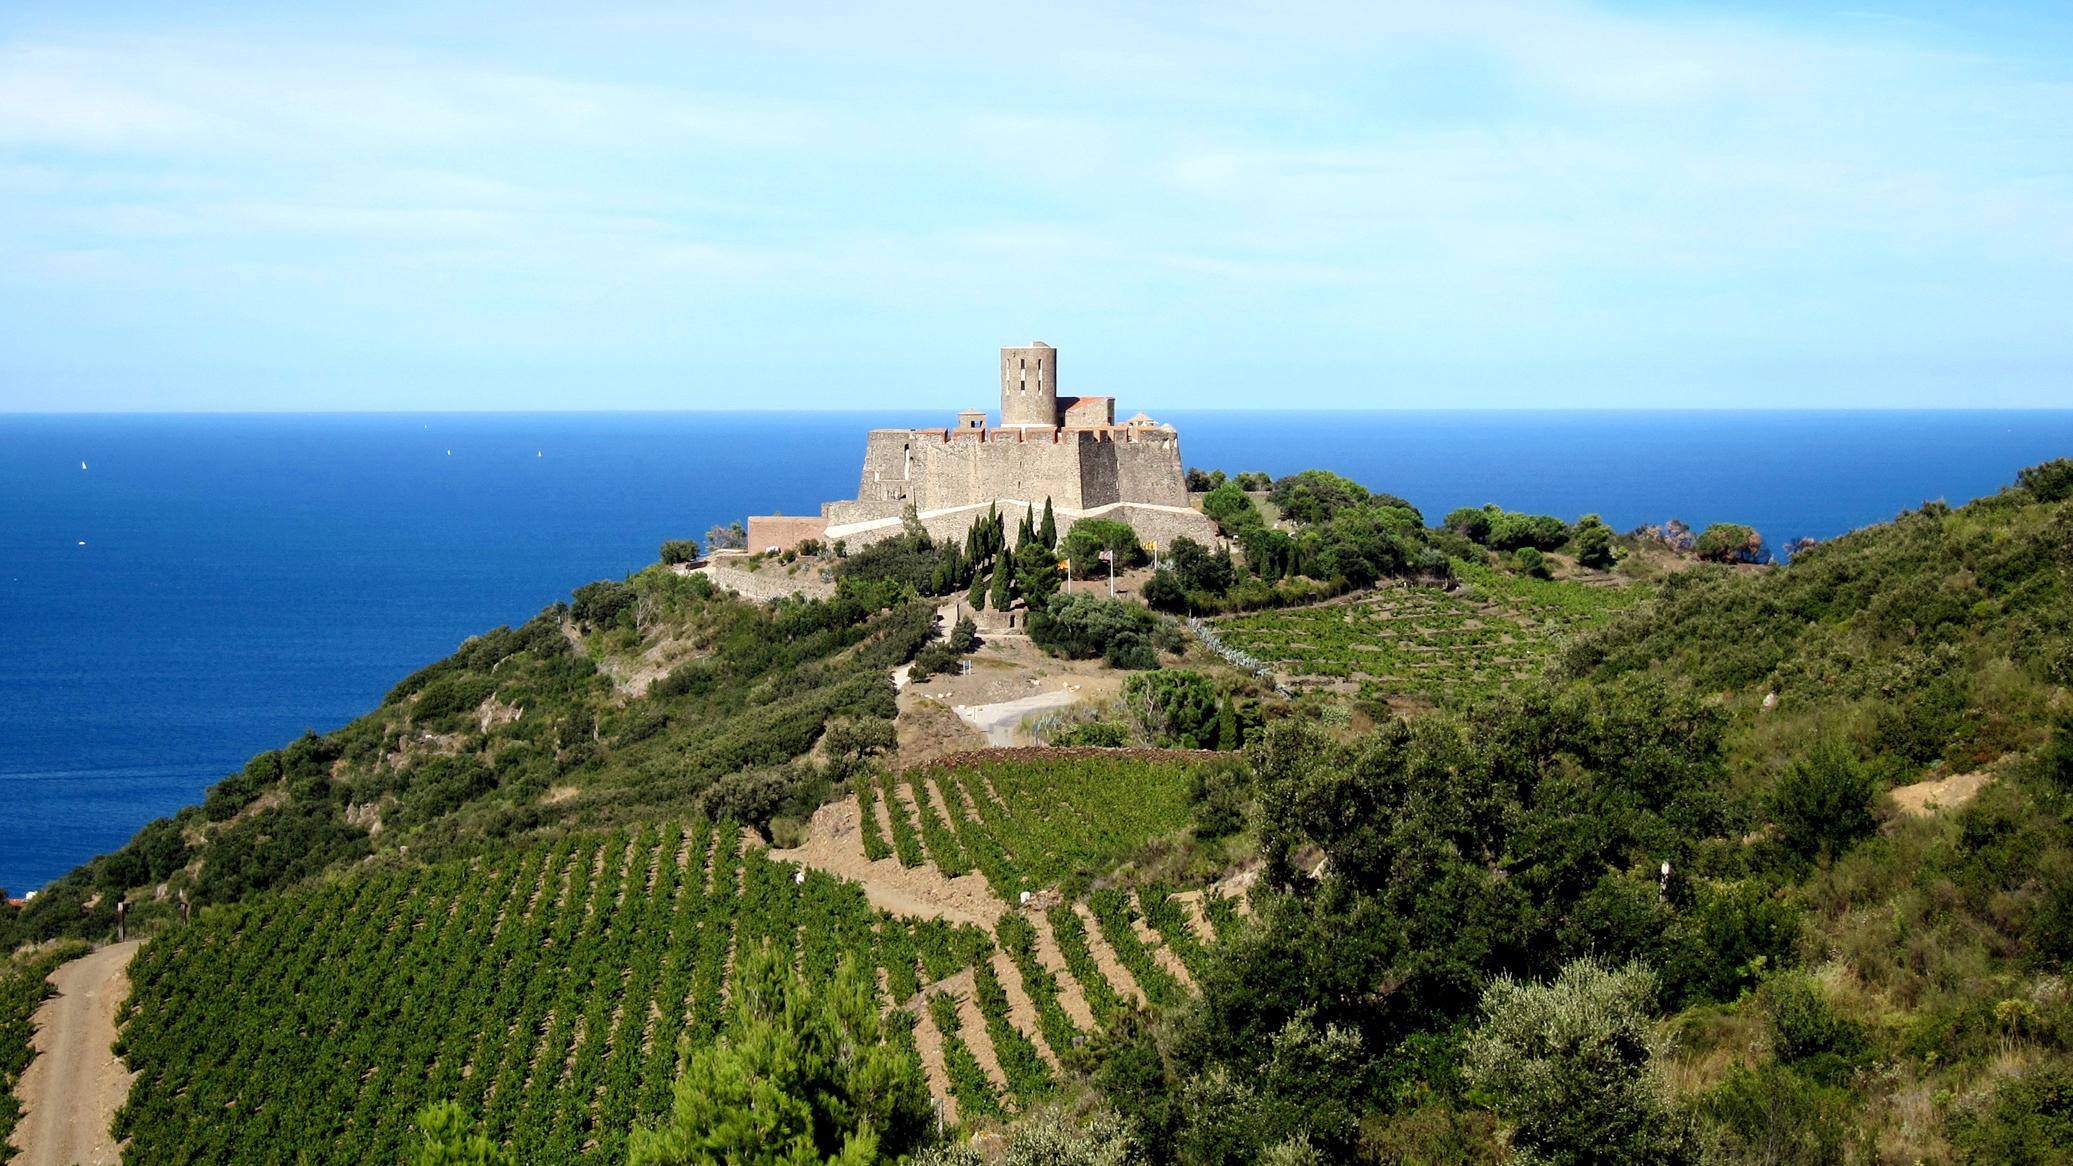 Fort-saint-elme_CC.jpg?1567768875